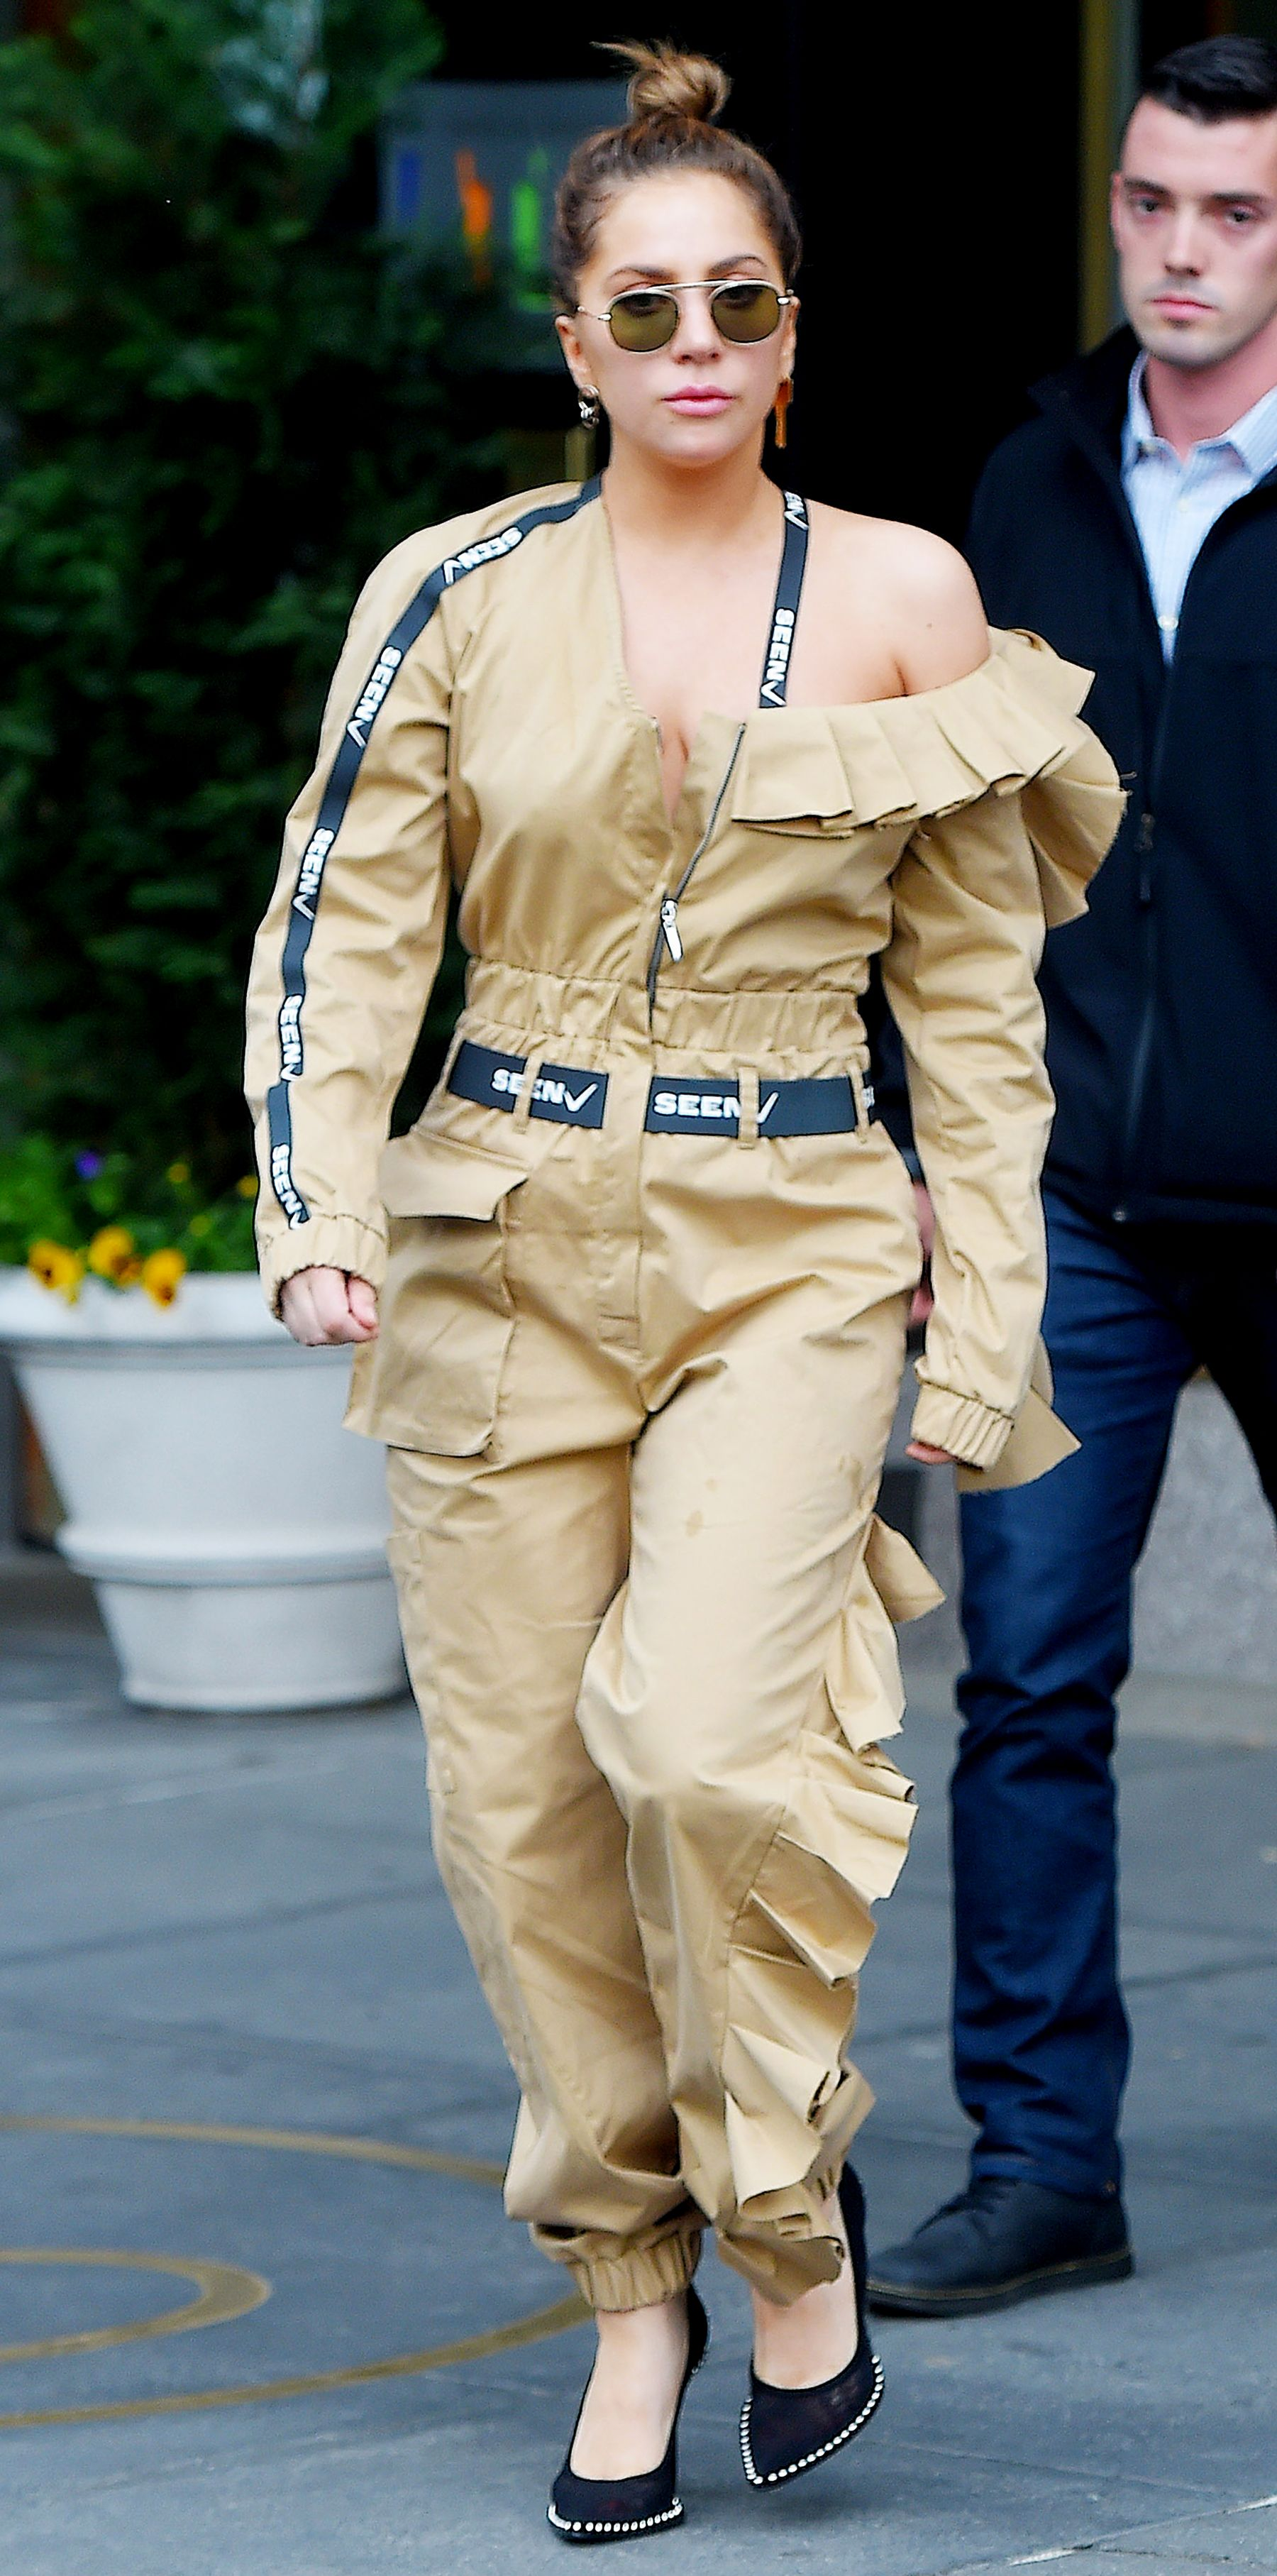 83ac506d505bd8 Lady Gaga s Best Street Style Looks